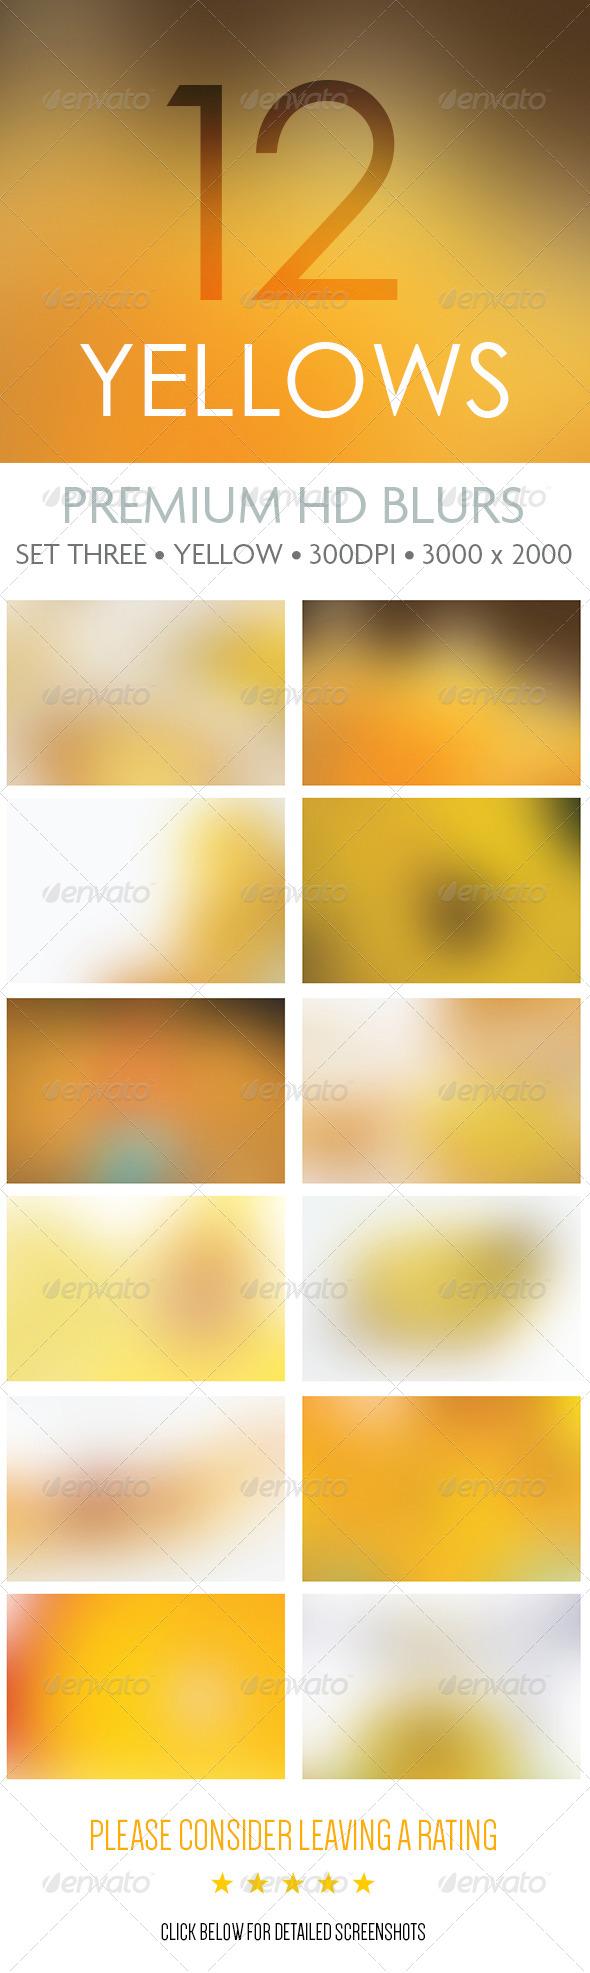 GraphicRiver Premium HD Blurs Set Three 6341717